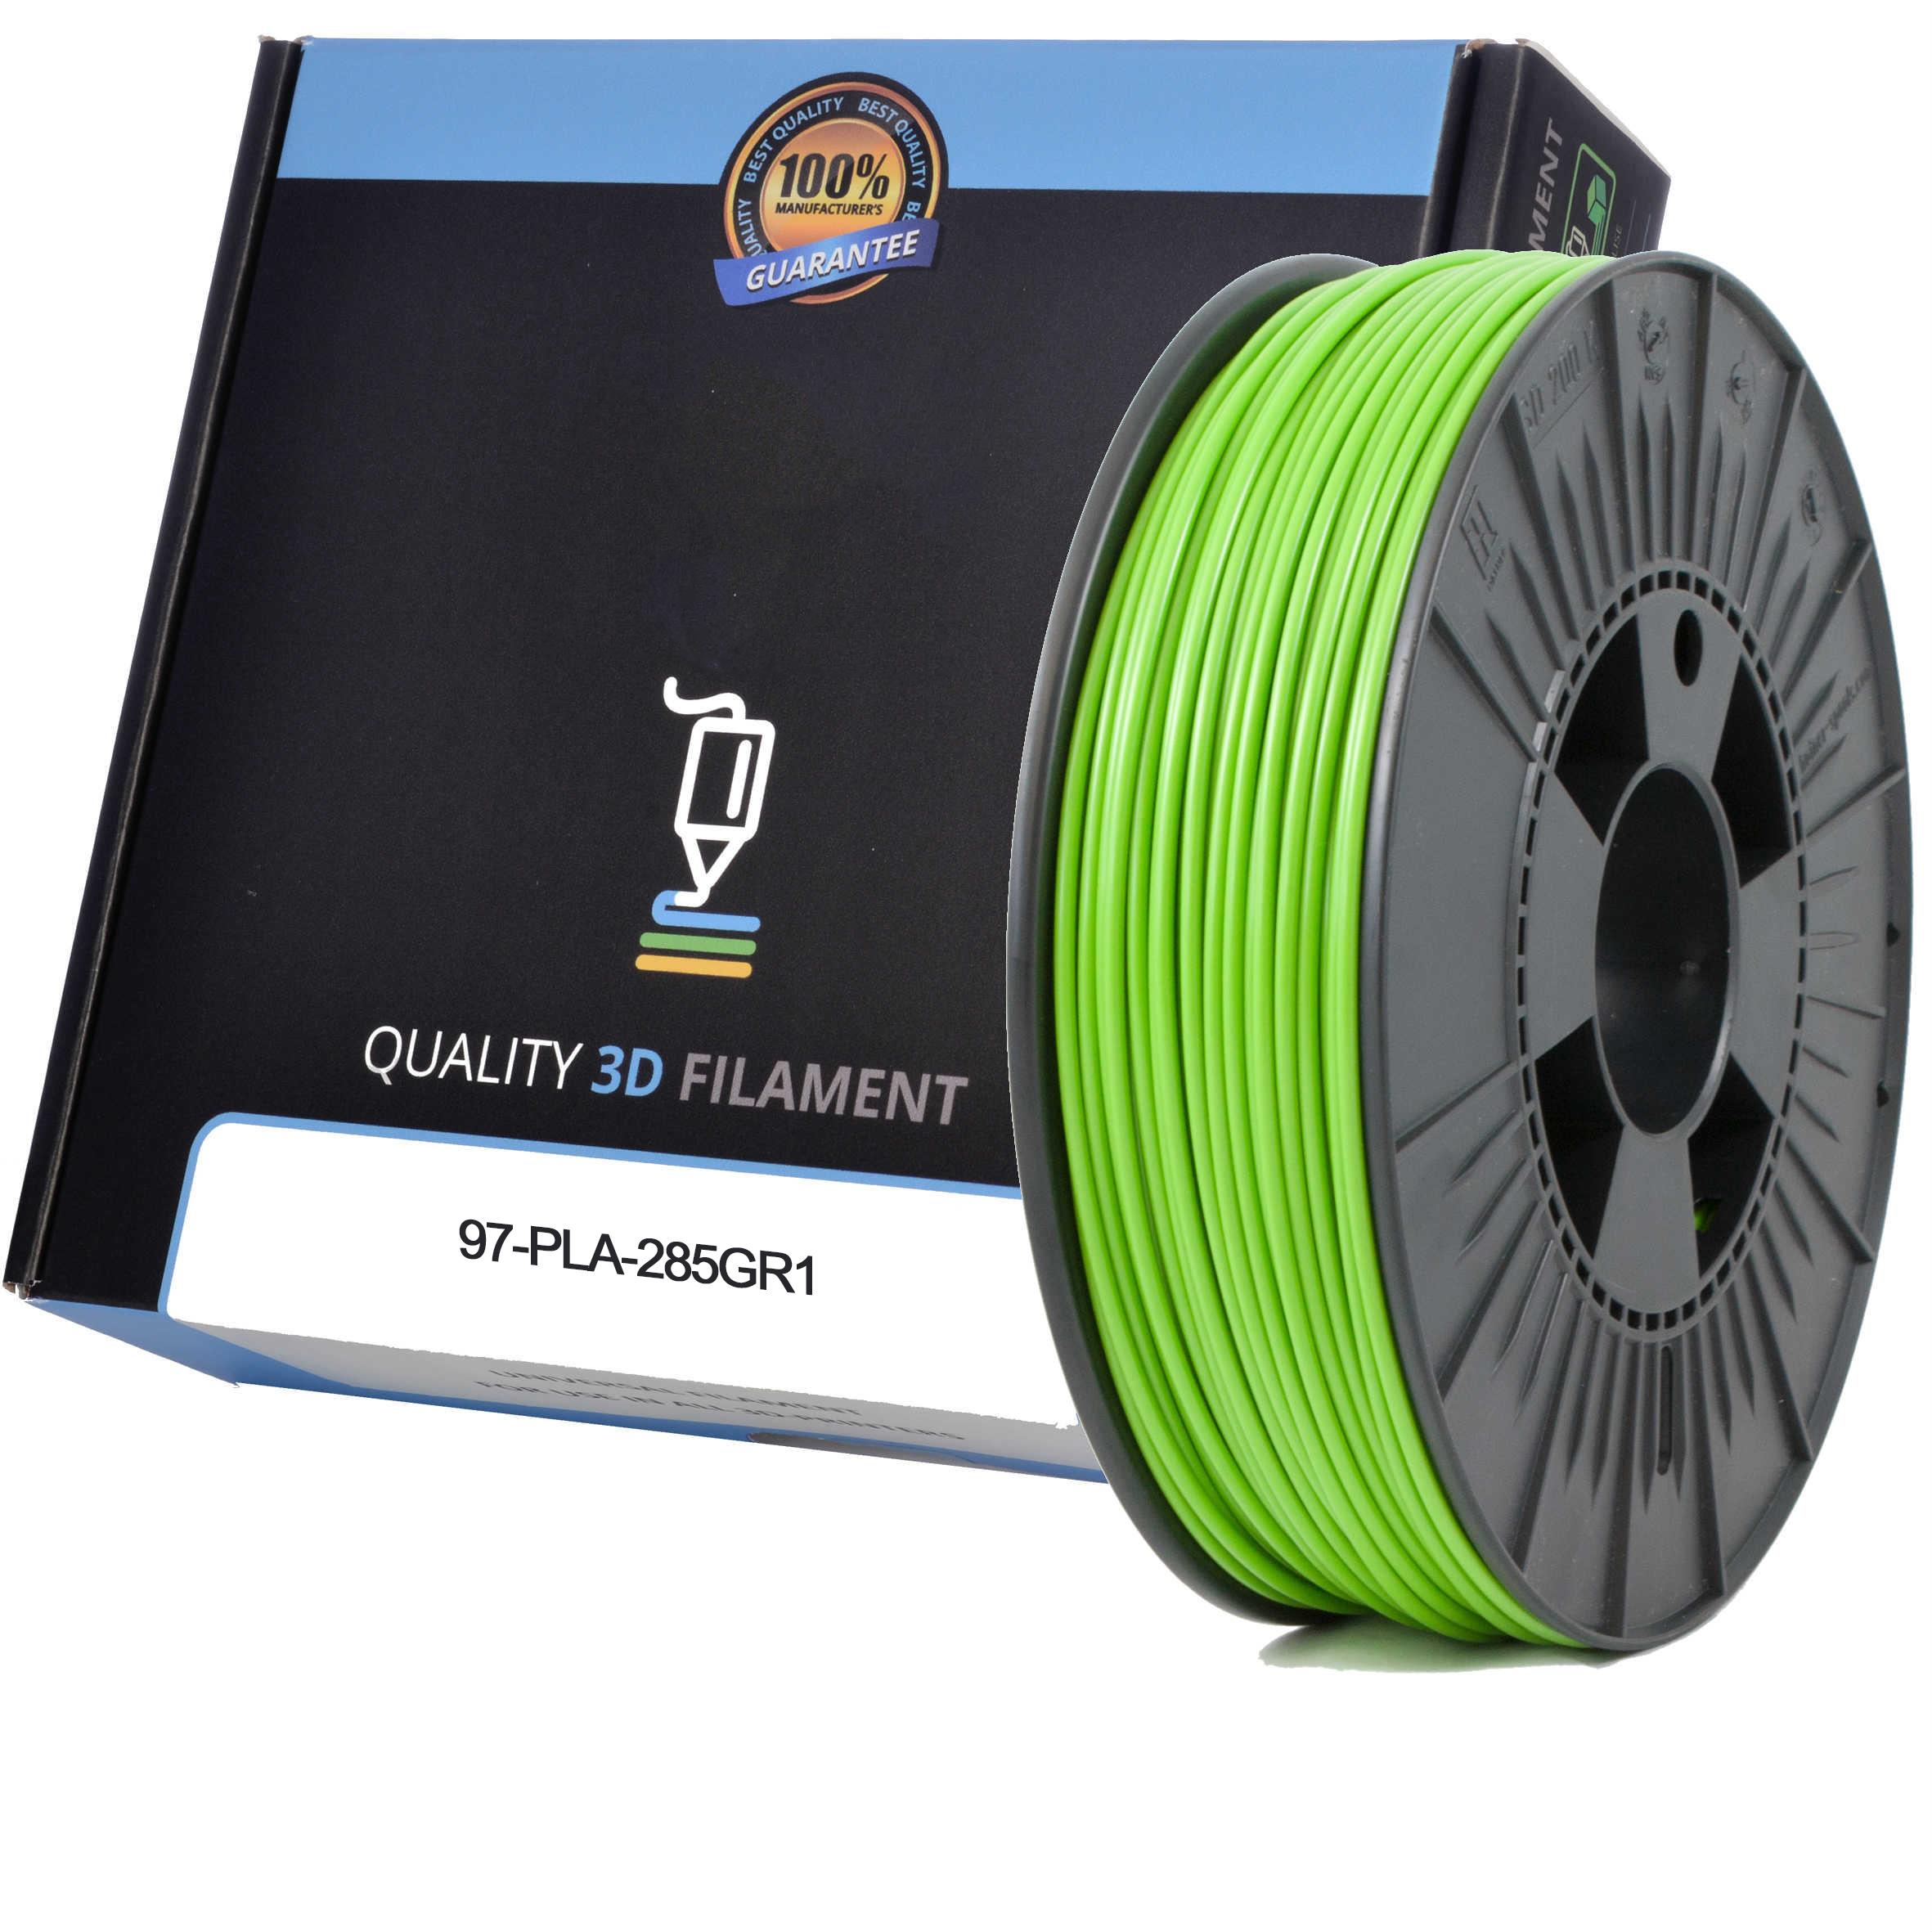 Premium Compatible PLA 2.85mm Apple Green 1kg 3D Filament (97-PLA-285GR1)